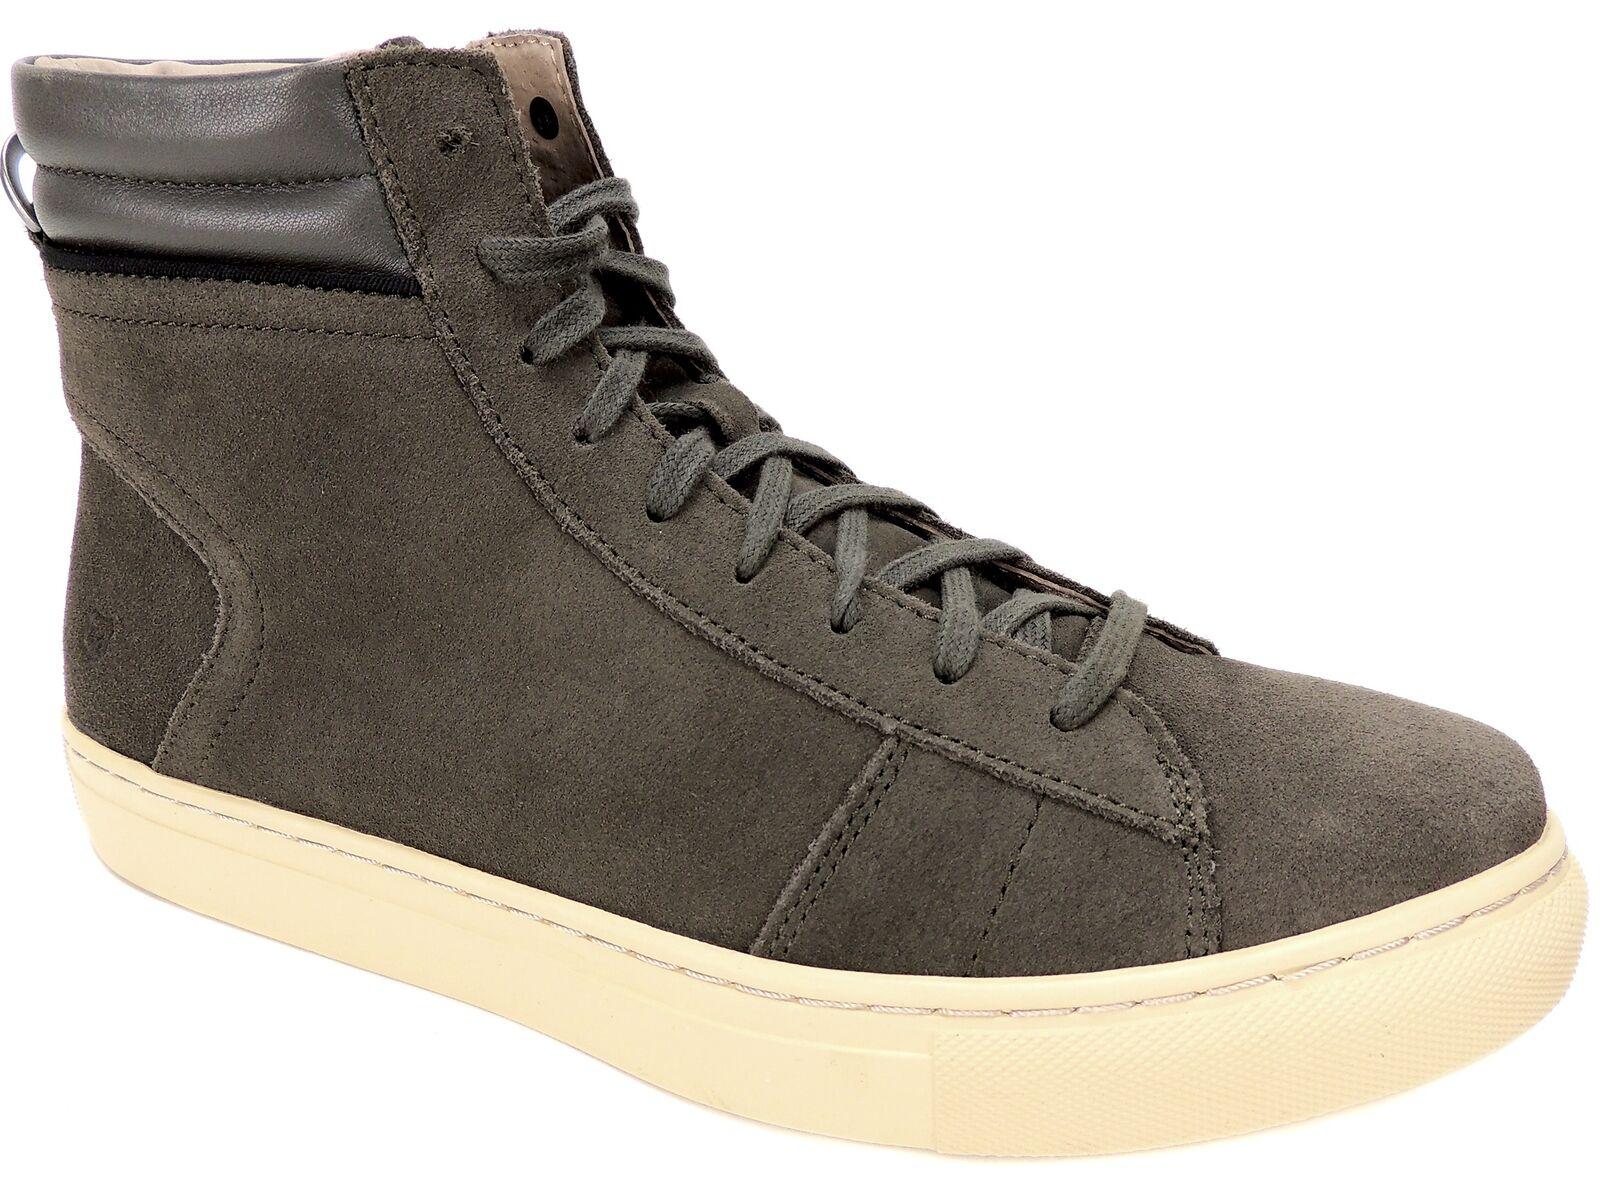 Andrew Marc Men's Remsen High-Top Sneakers Gun/Cream Leather Size 10 D